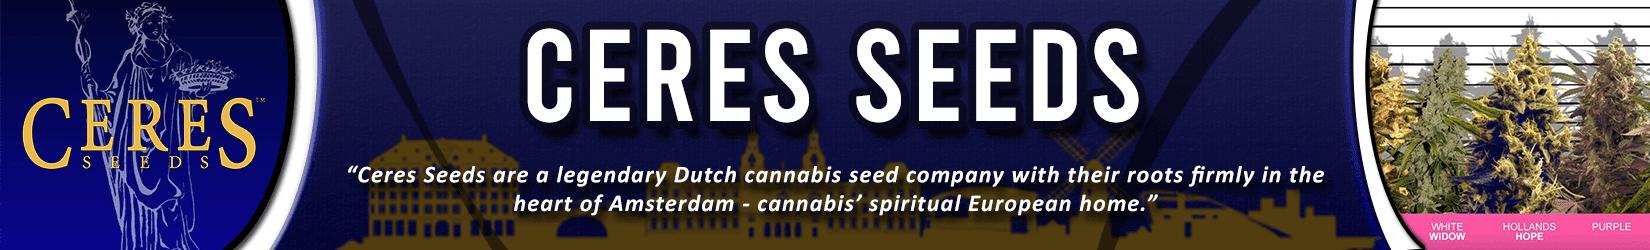 Cannabis Seeds Breeder - Ceres Seeds